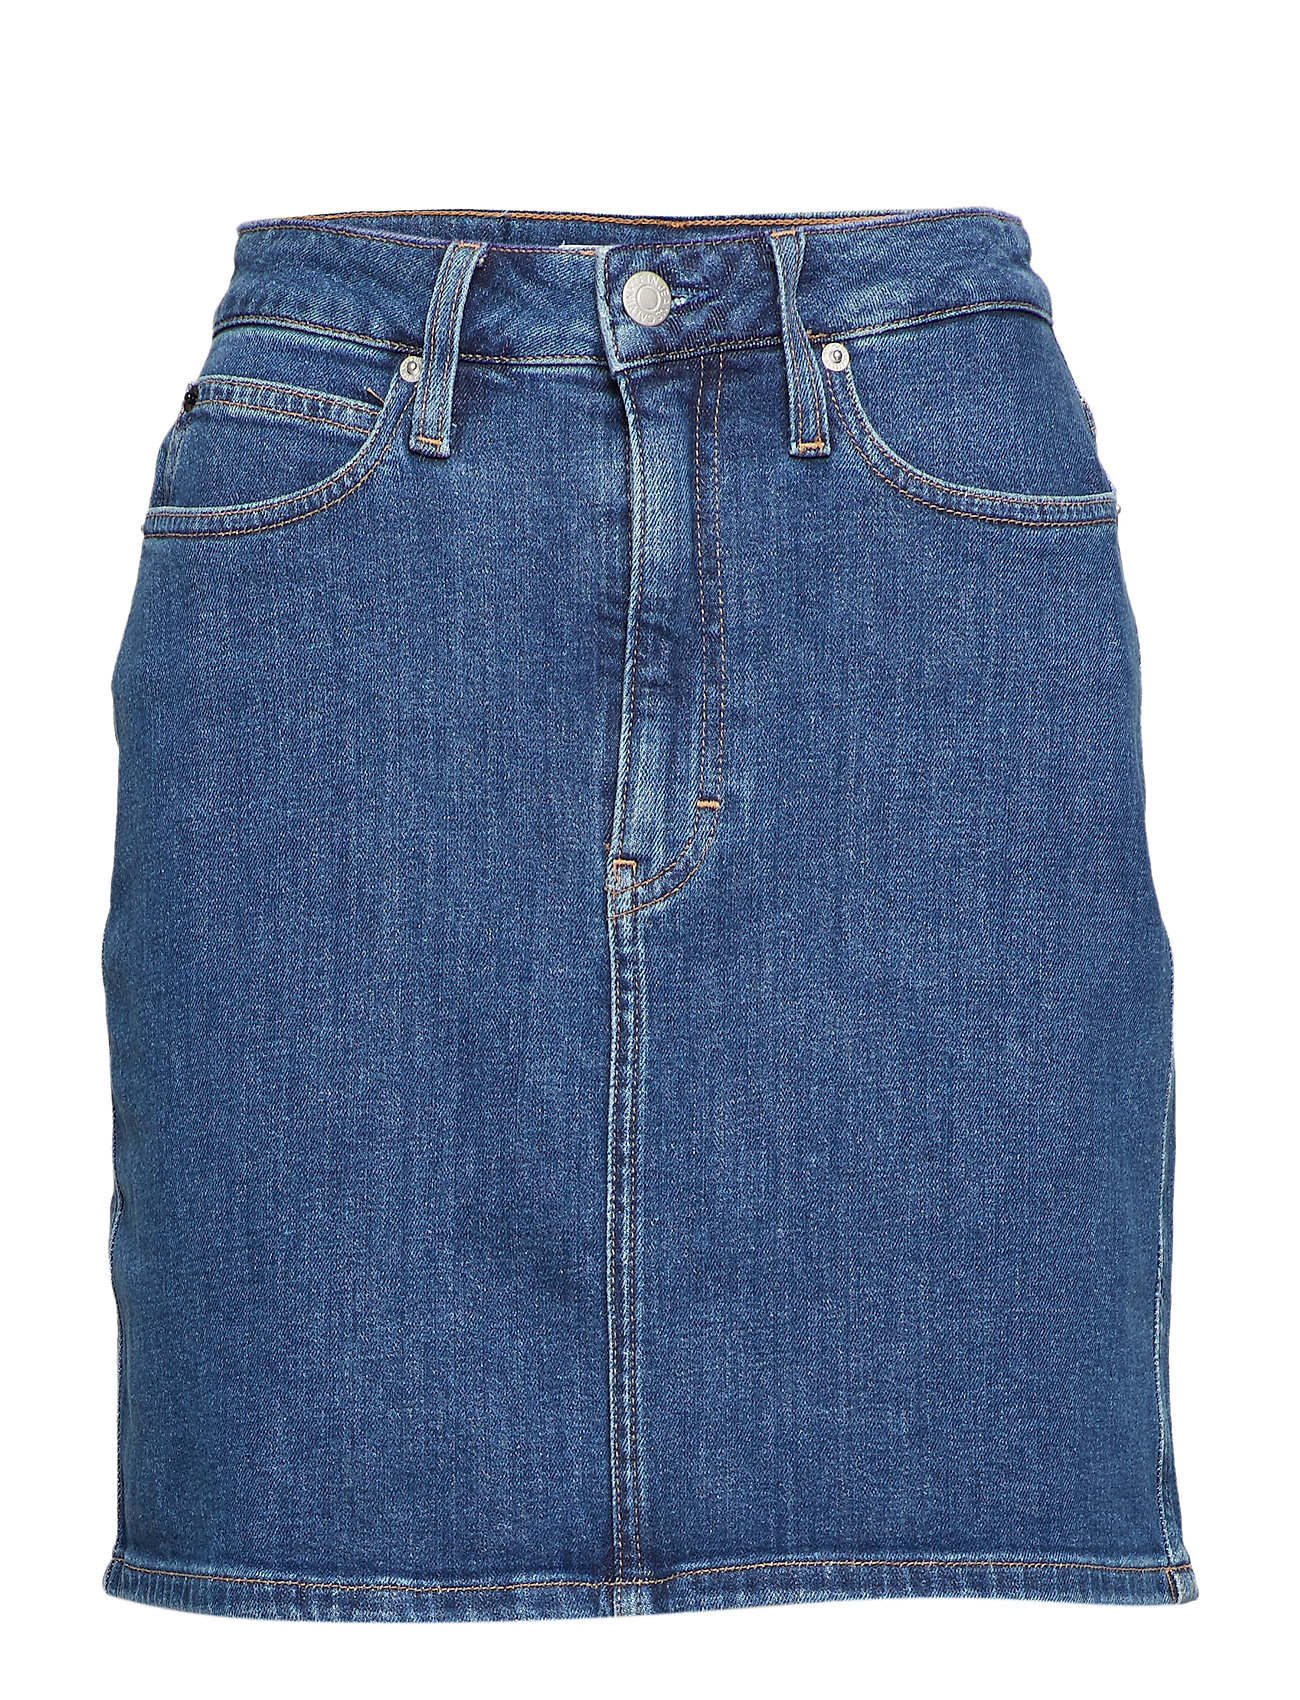 Calvin Klein Jeans HR MINI SKIRT - RODEO BLUE